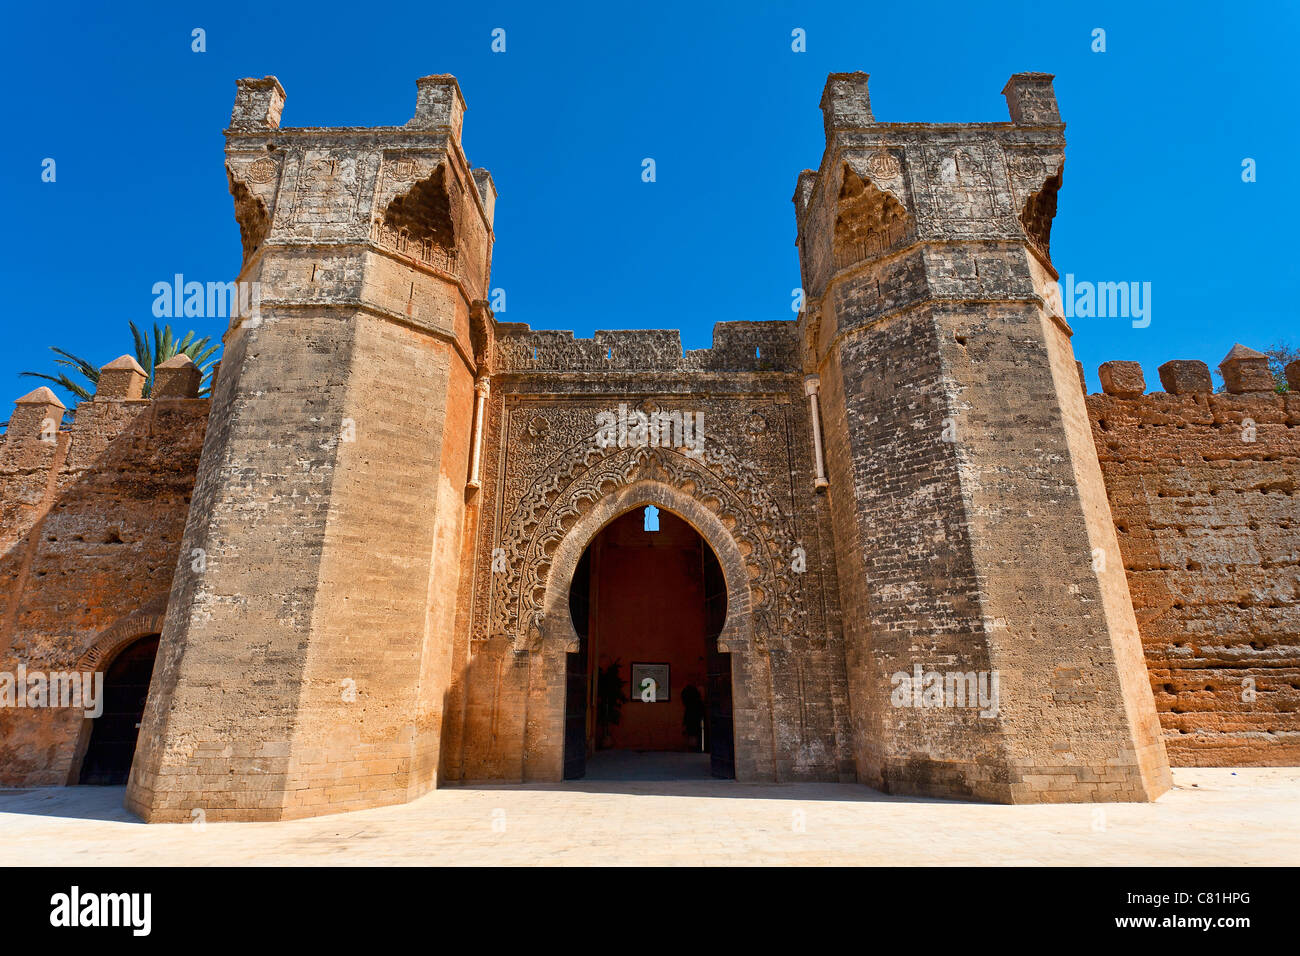 Rabat, Entrance of Chellah Necropolis - Stock Image